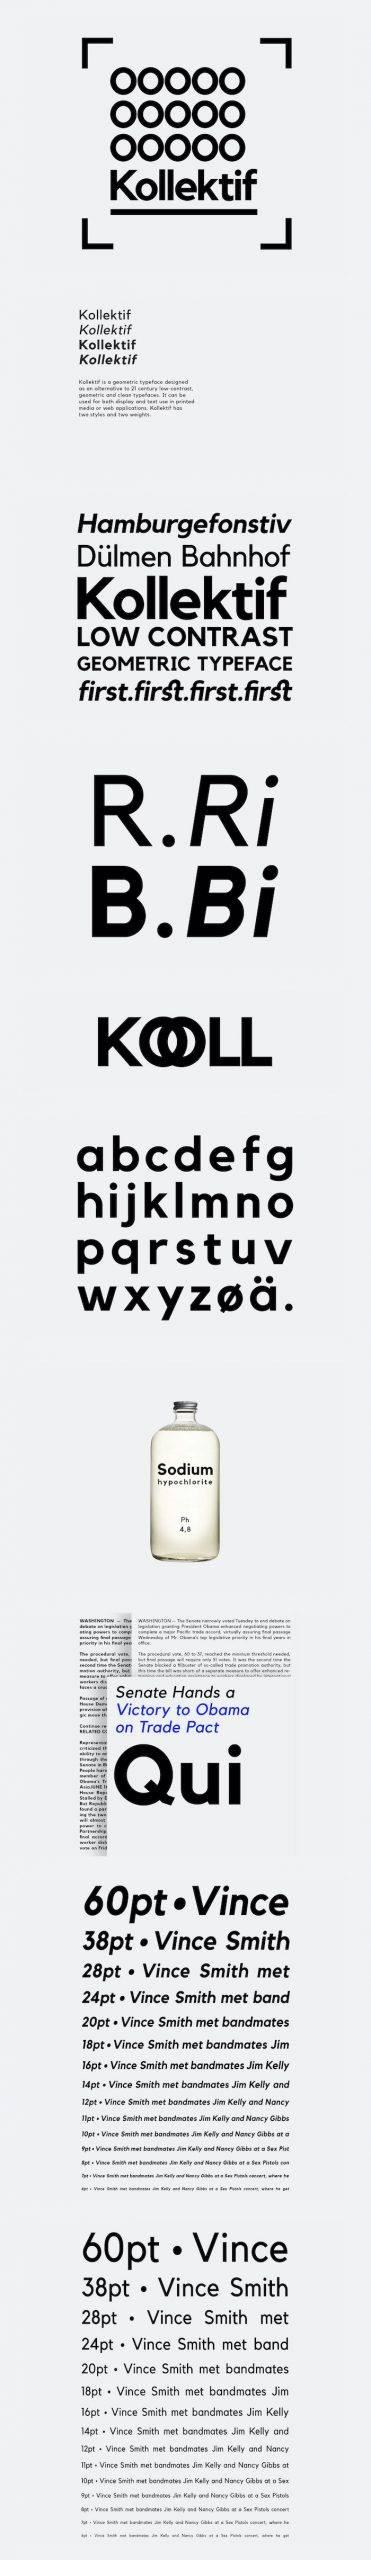 kollektif font free download